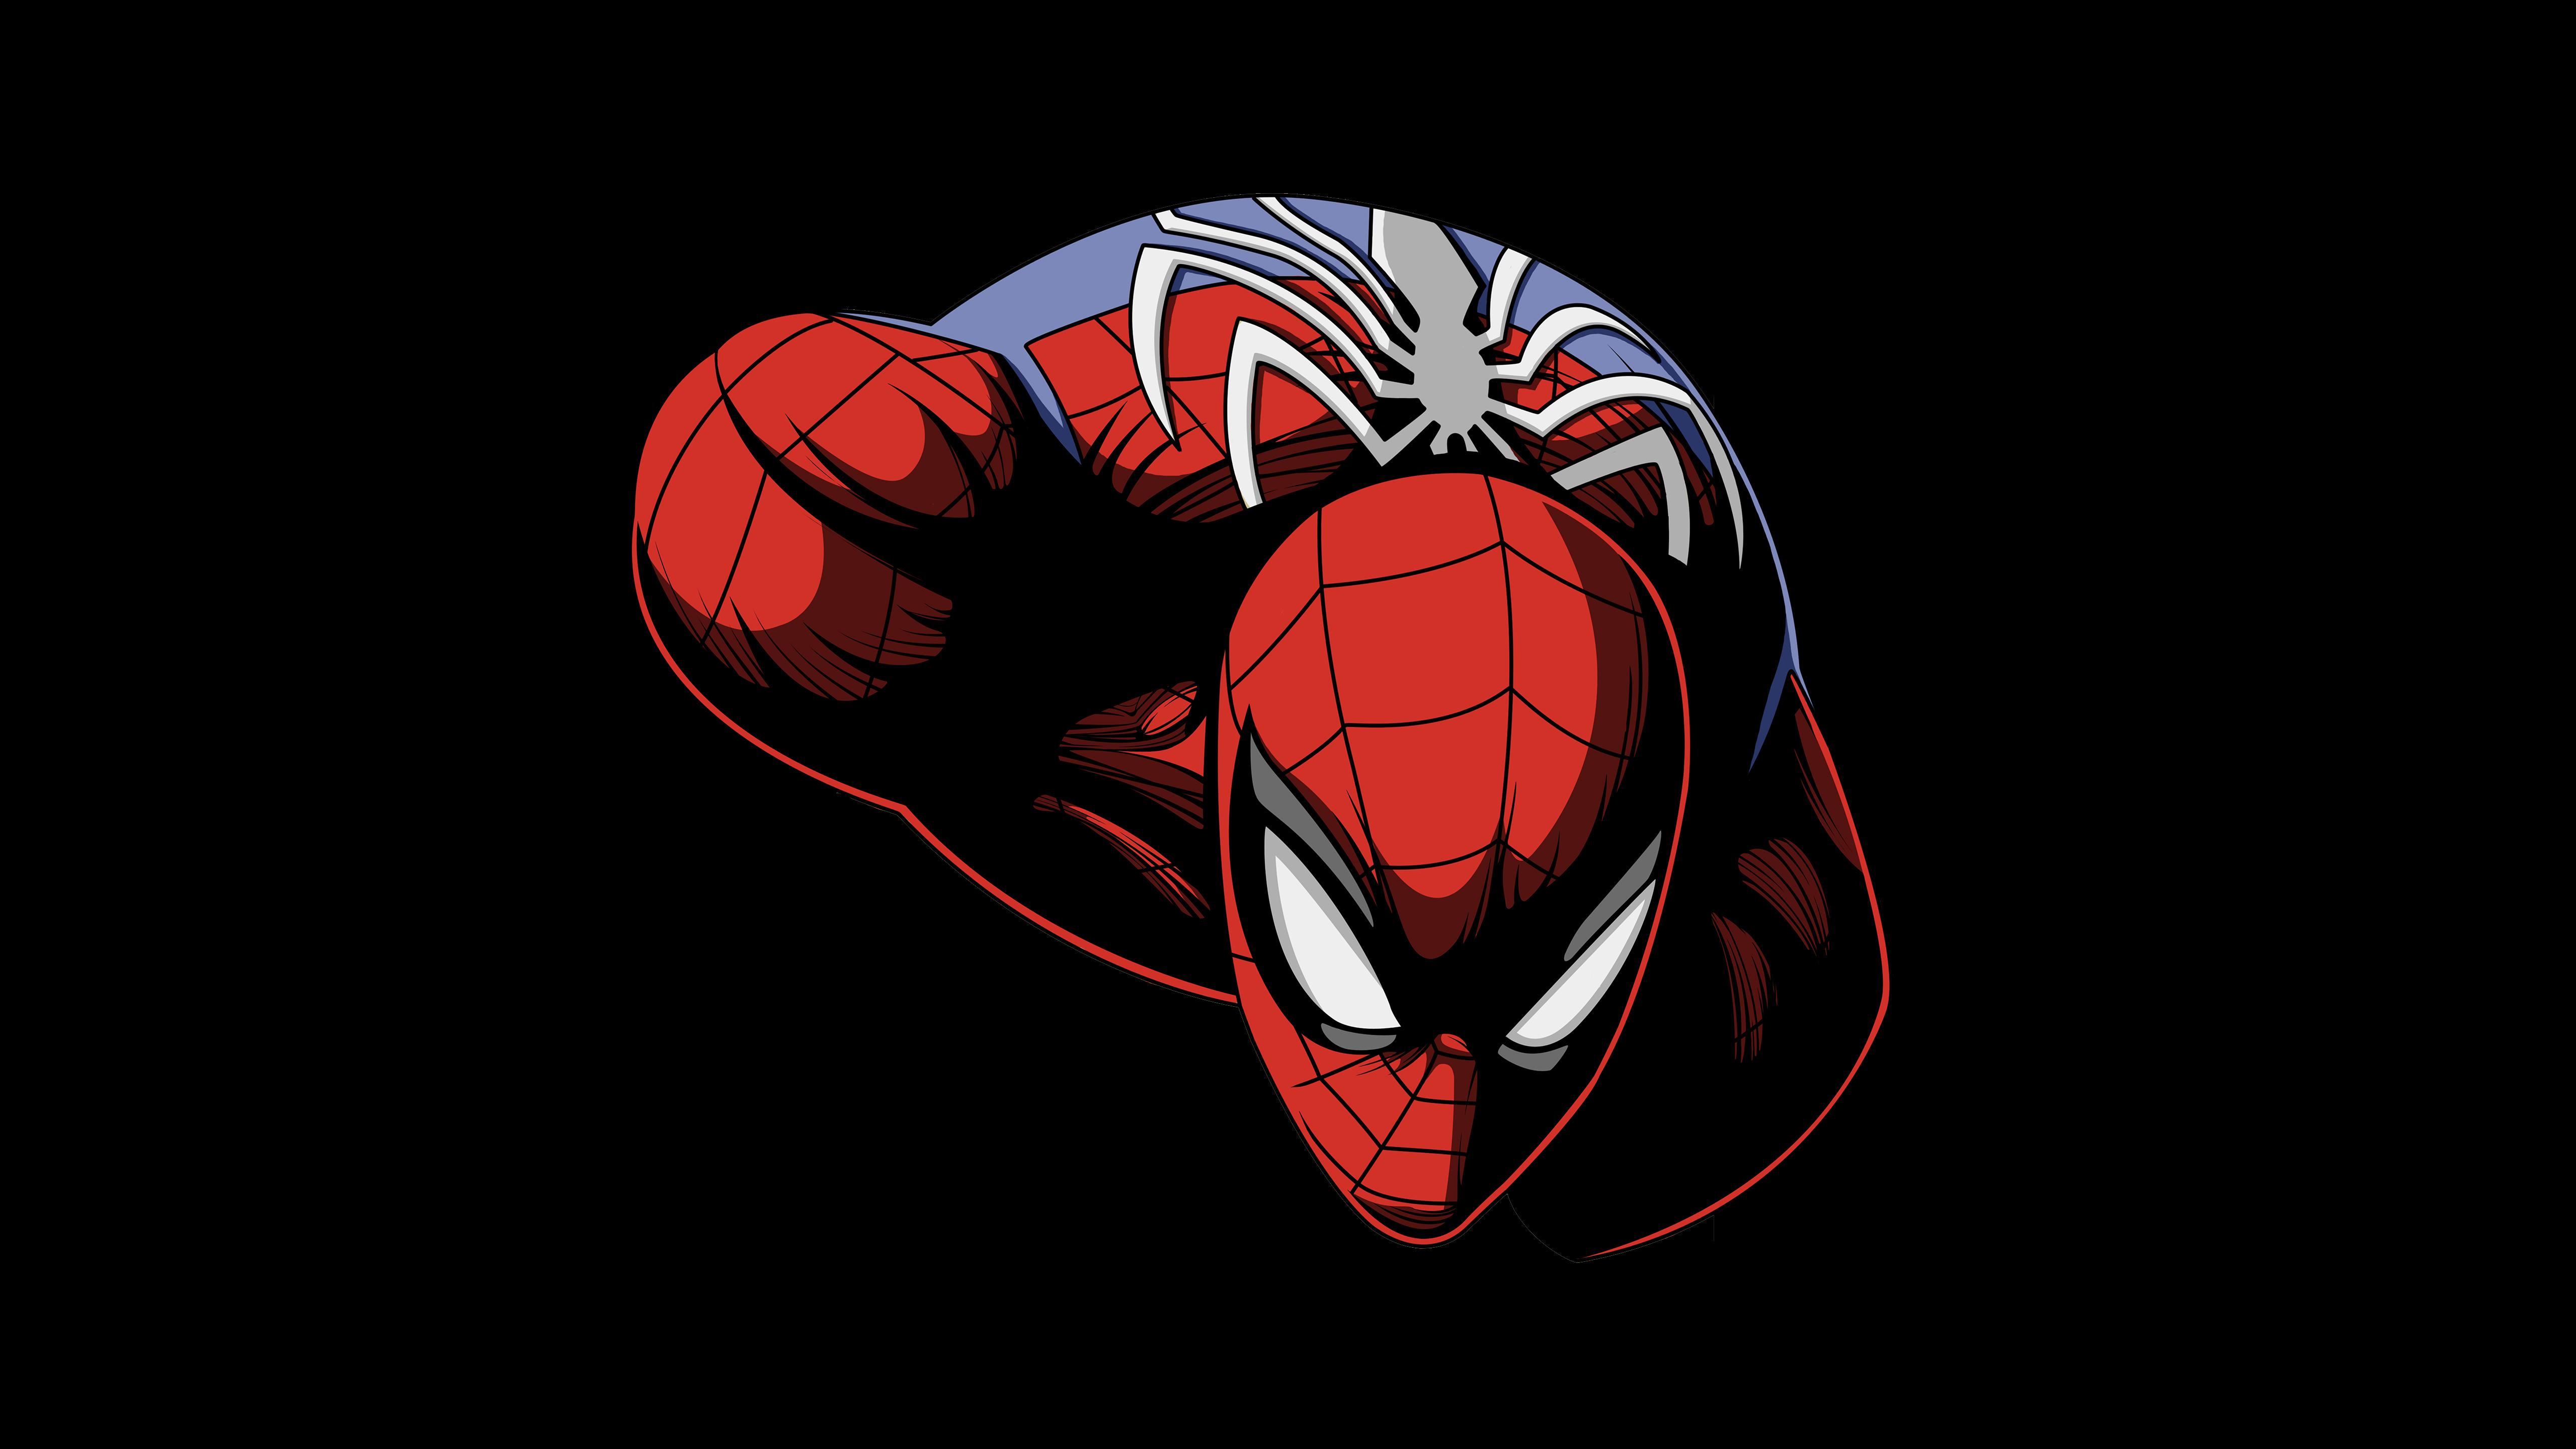 3840x2160 Spiderman Dark Oled 5k 4k HD 4k Wallpapers ...